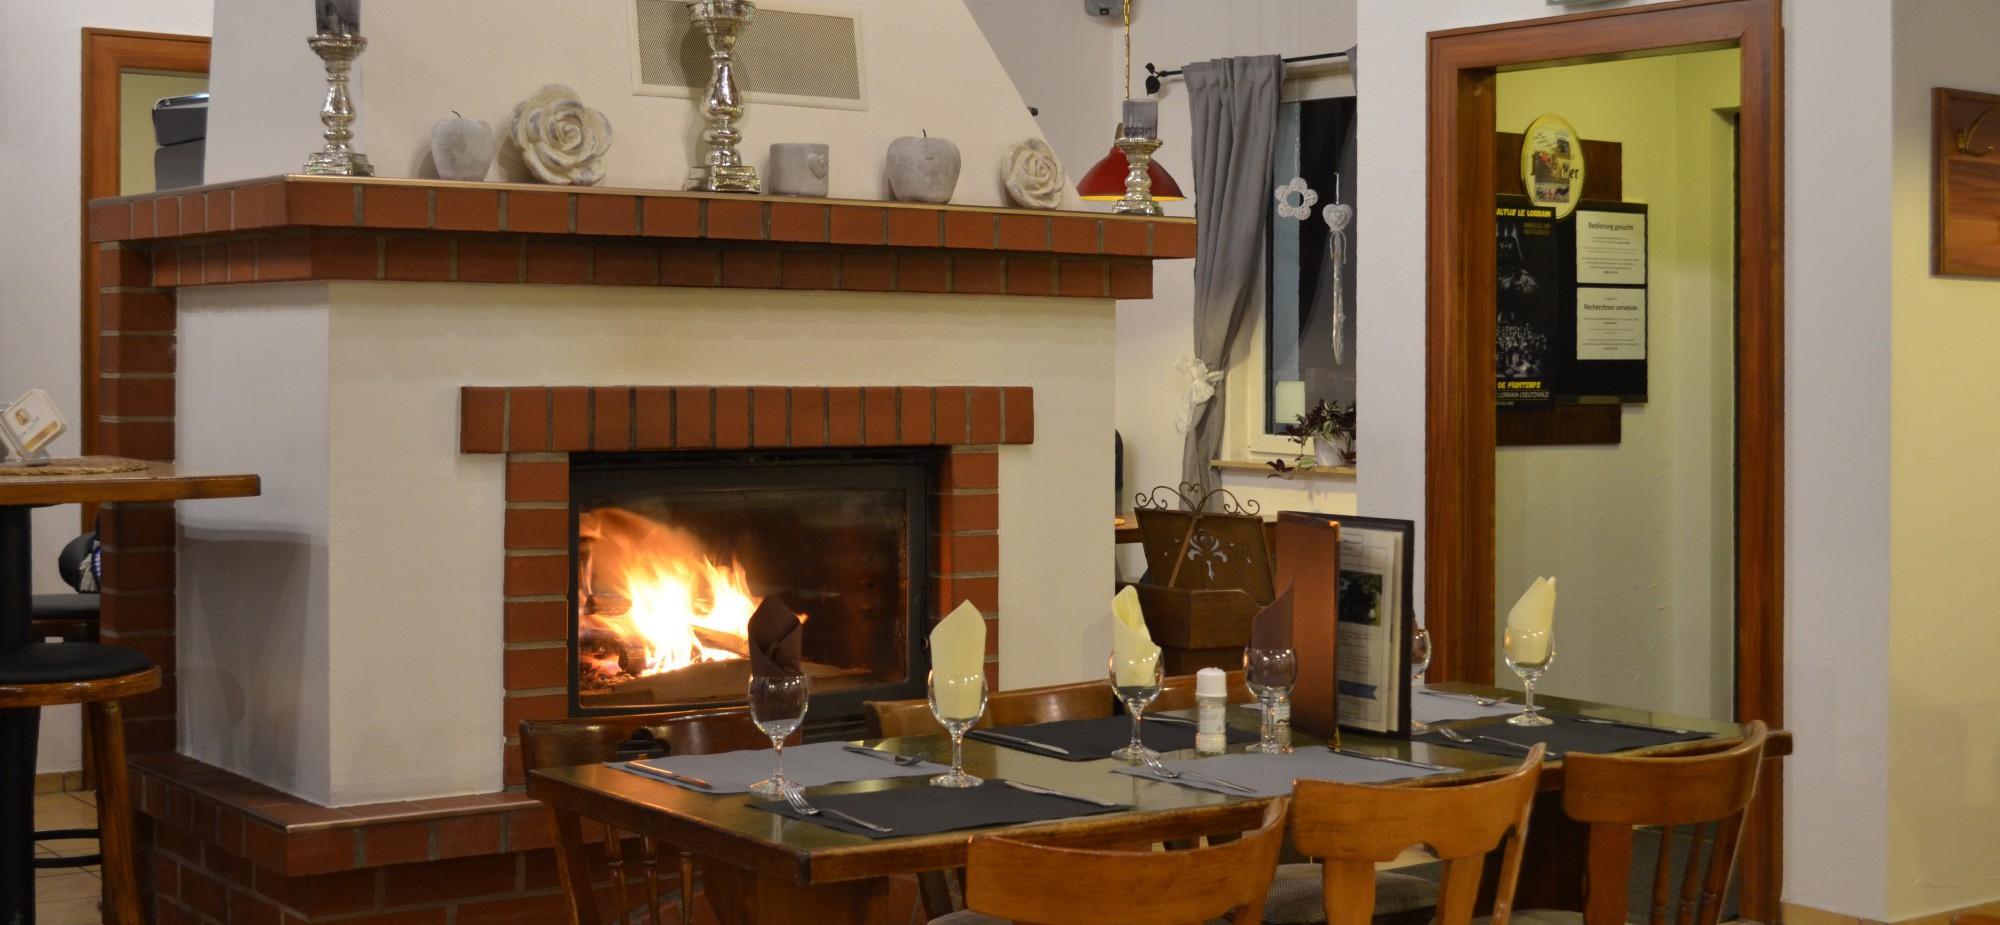 Restaurant-Schmuggelbud-Überherrn-Winter-Kamin